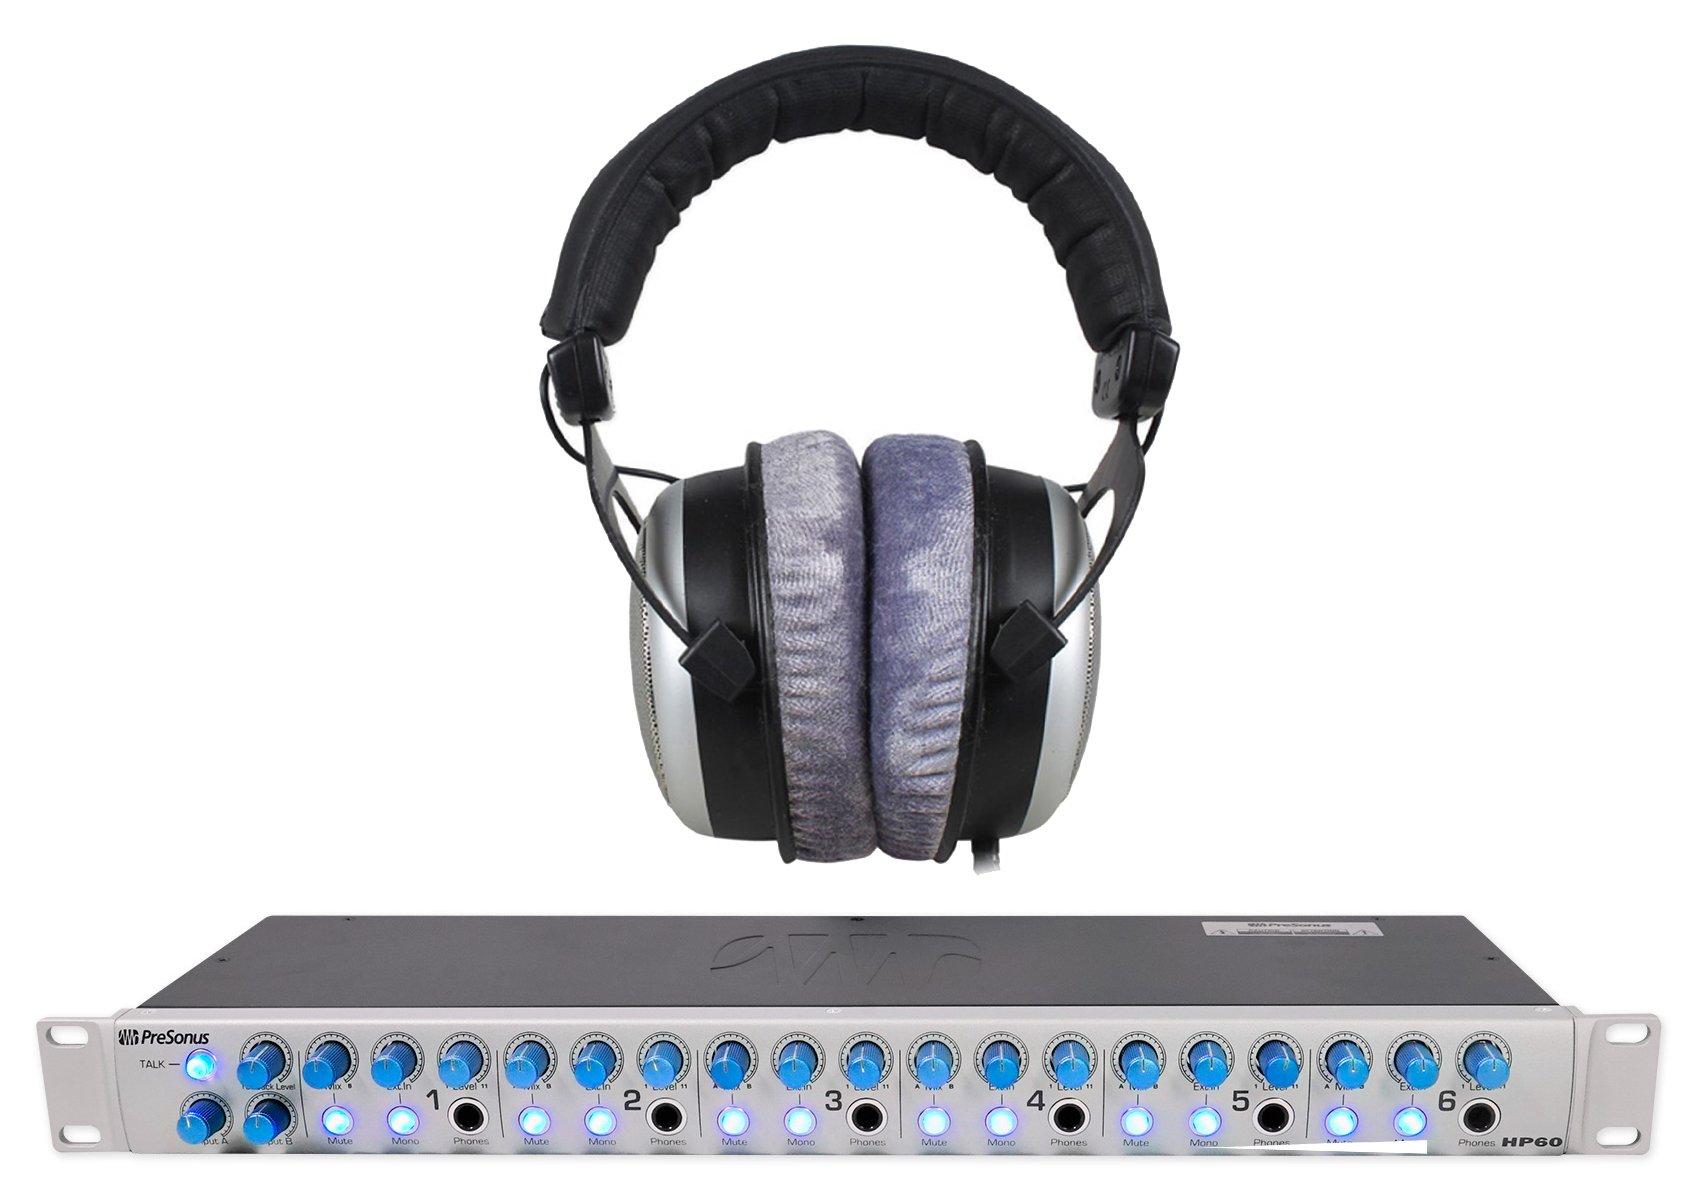 Beyerdynamic DT-880 Pro 250 Ohm +Presonus HP60 6 Channel Headphone Amplifier Amp